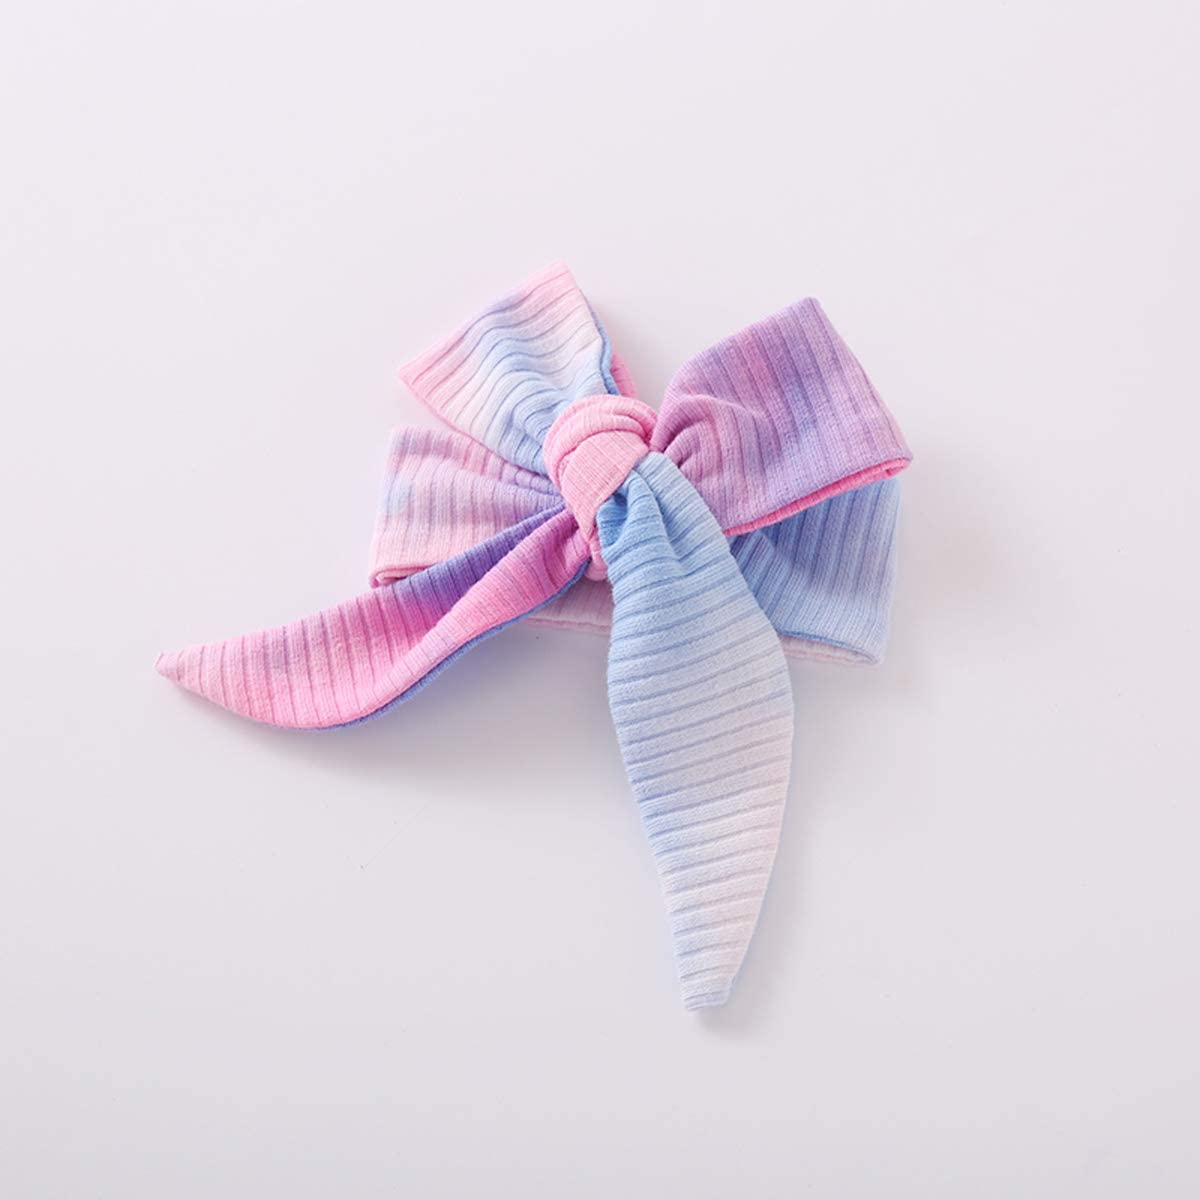 Newborn Baby Girl Pajamas Tie Dye, Organic Cotton Kimono Onesies+Pants+Headband, Infant Baby Top Pants Set